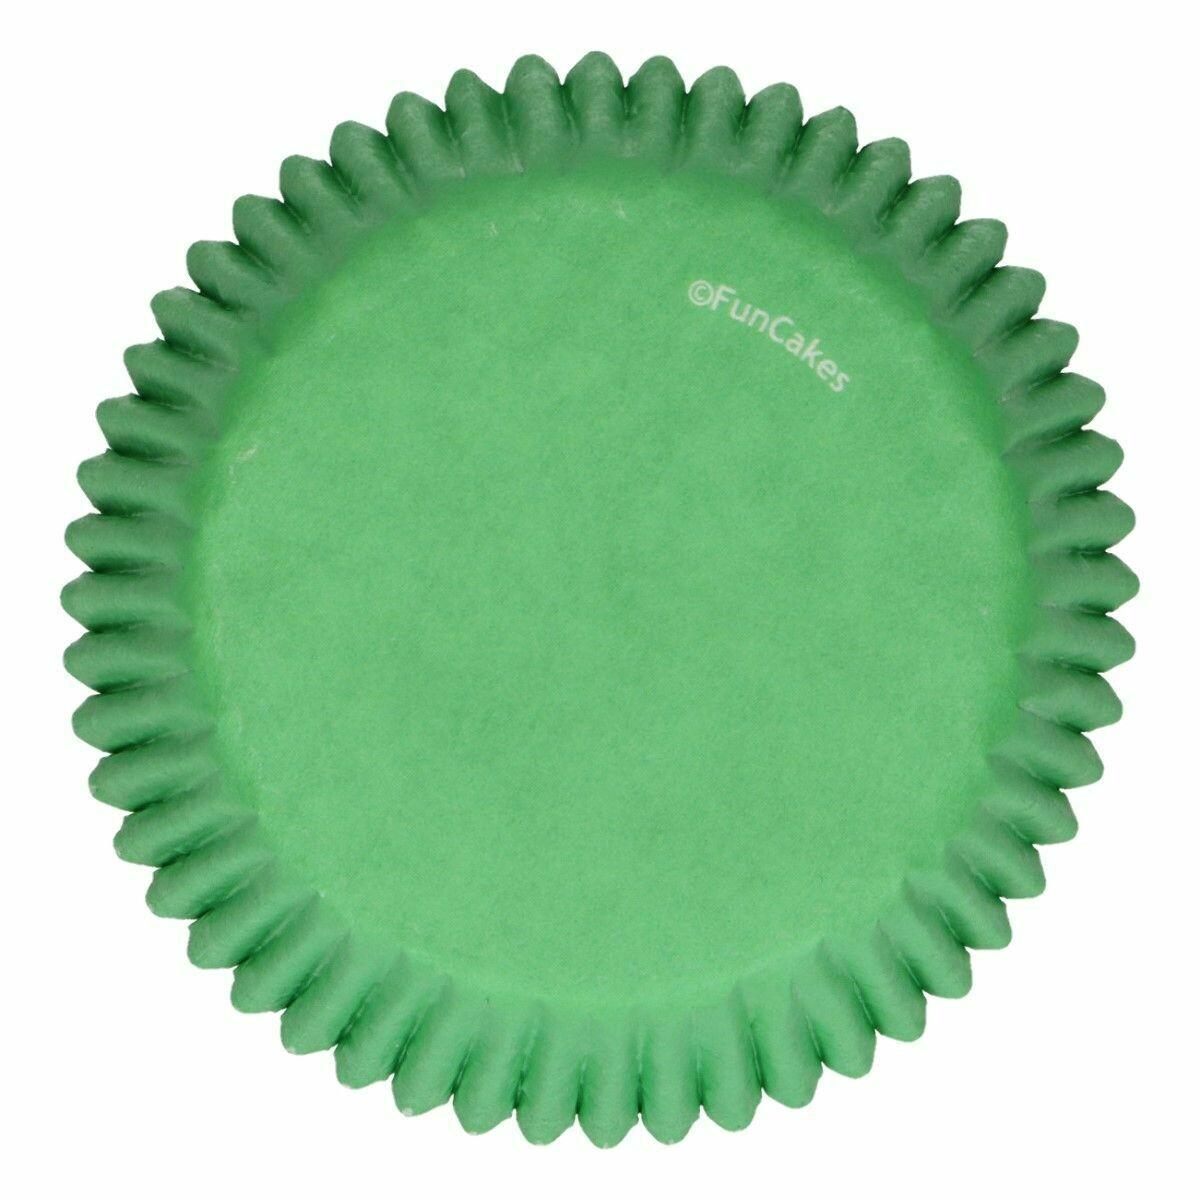 FunCakes Cupcake Cases -GRASS GREEN -Θήκες Ψησίματος -Πράσινο Γρασίδι -48 τεμ